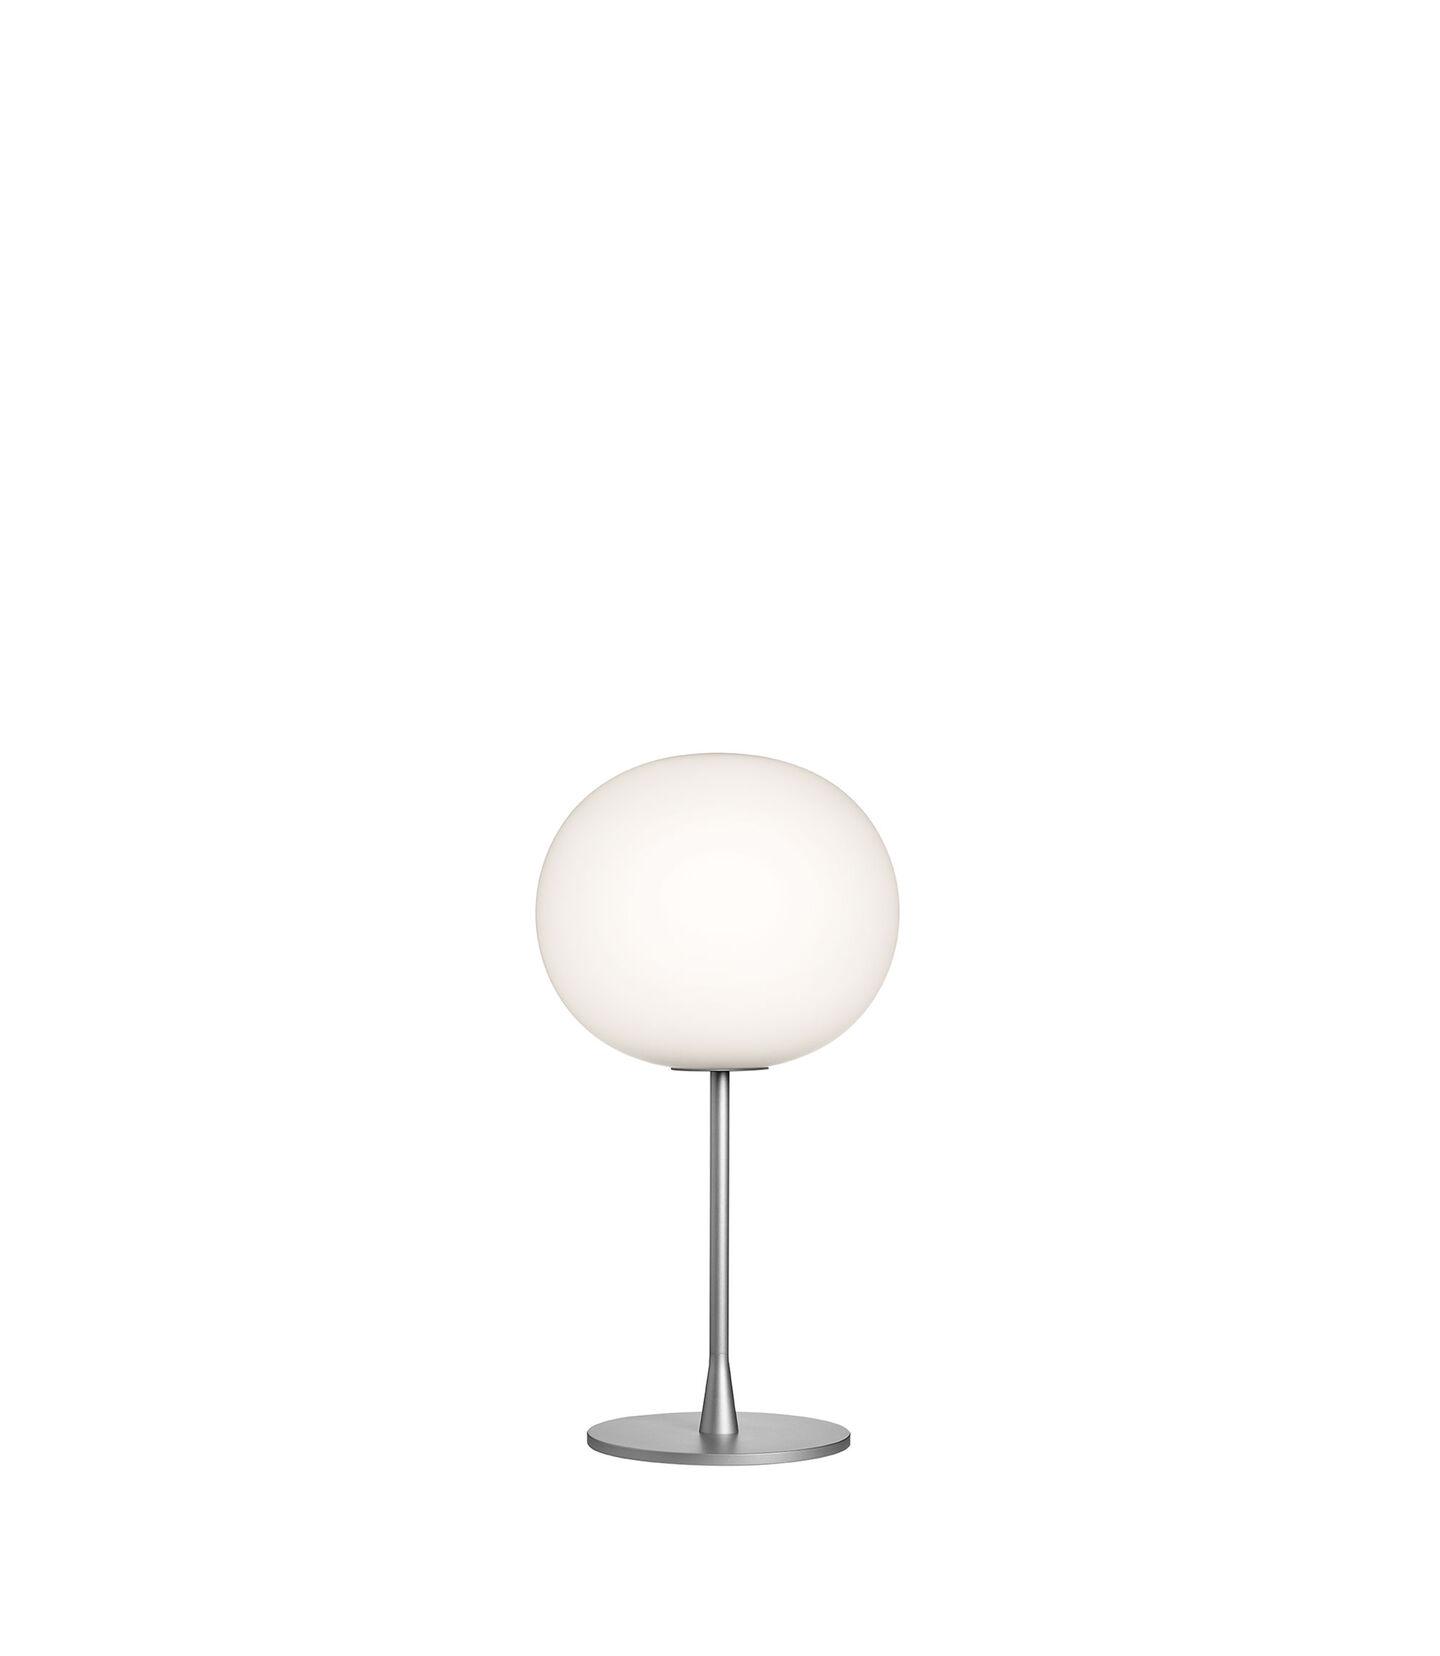 glo-ball-table-1-morrison-flos-F3020000-product-still-life-big